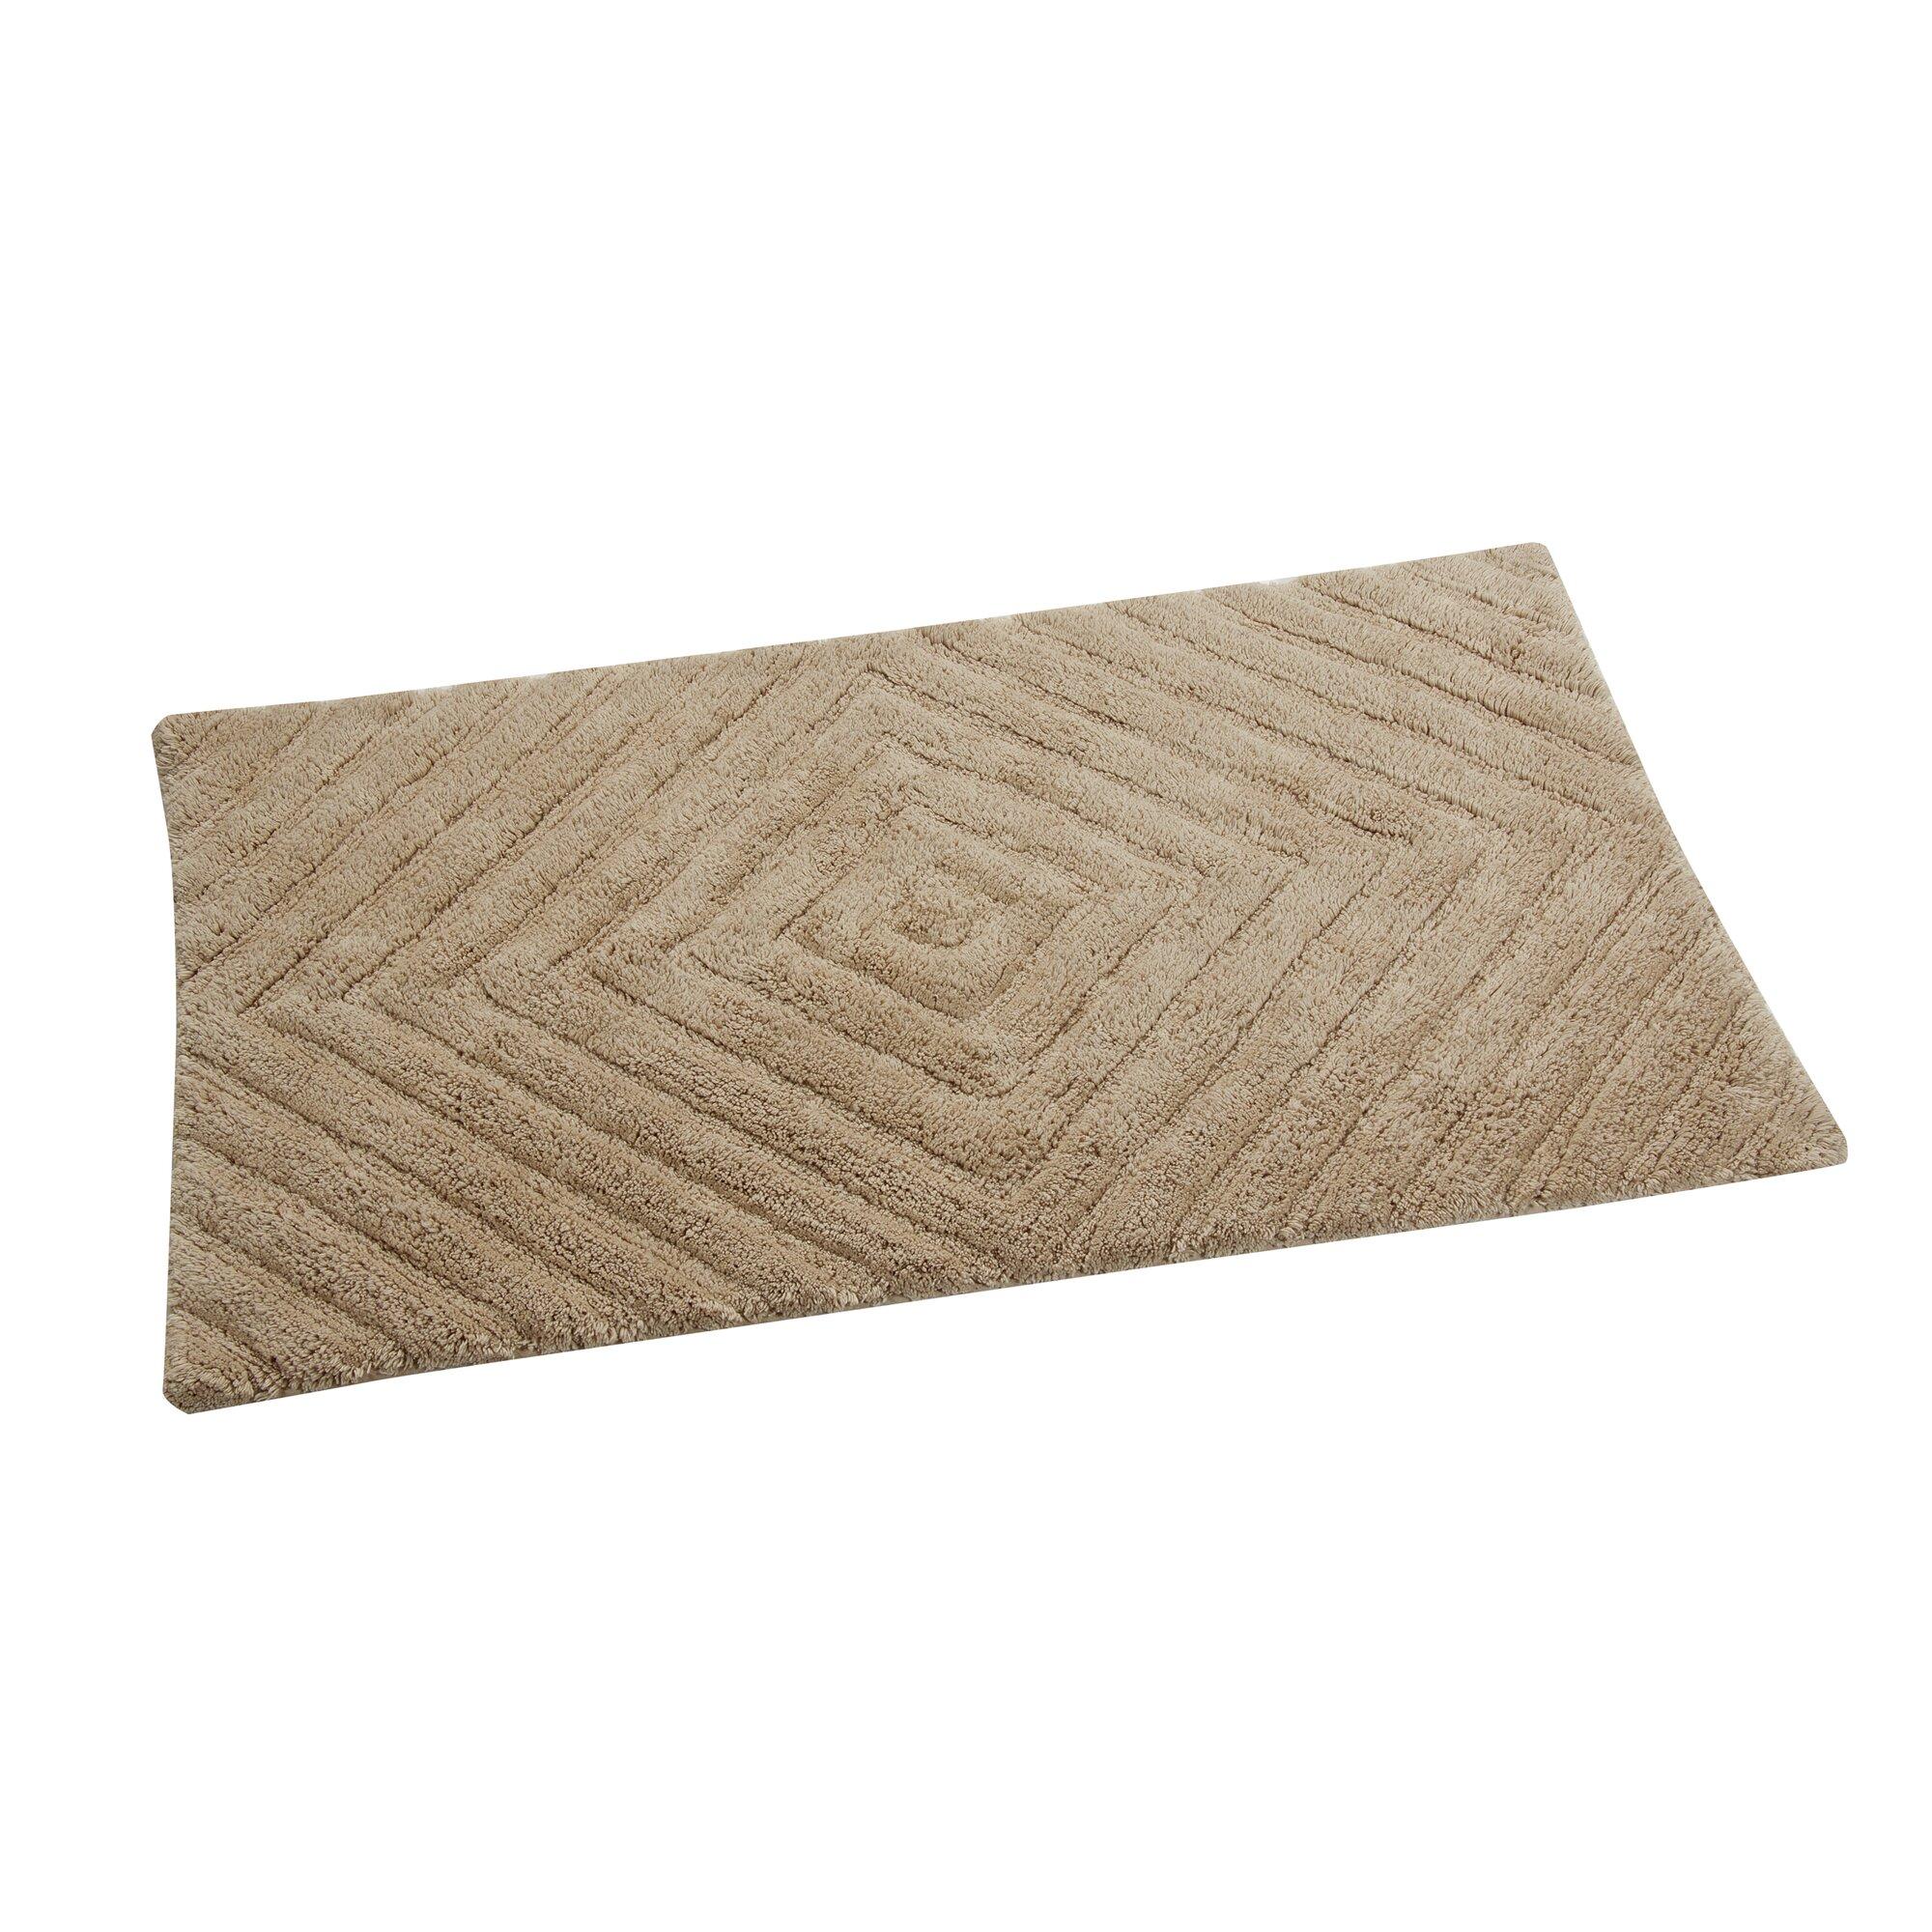 12 inspiring frontgate bath rugs designer bathroom rug sets target memory foam bathroom rugs - Designer bathroom rugs and mats ...